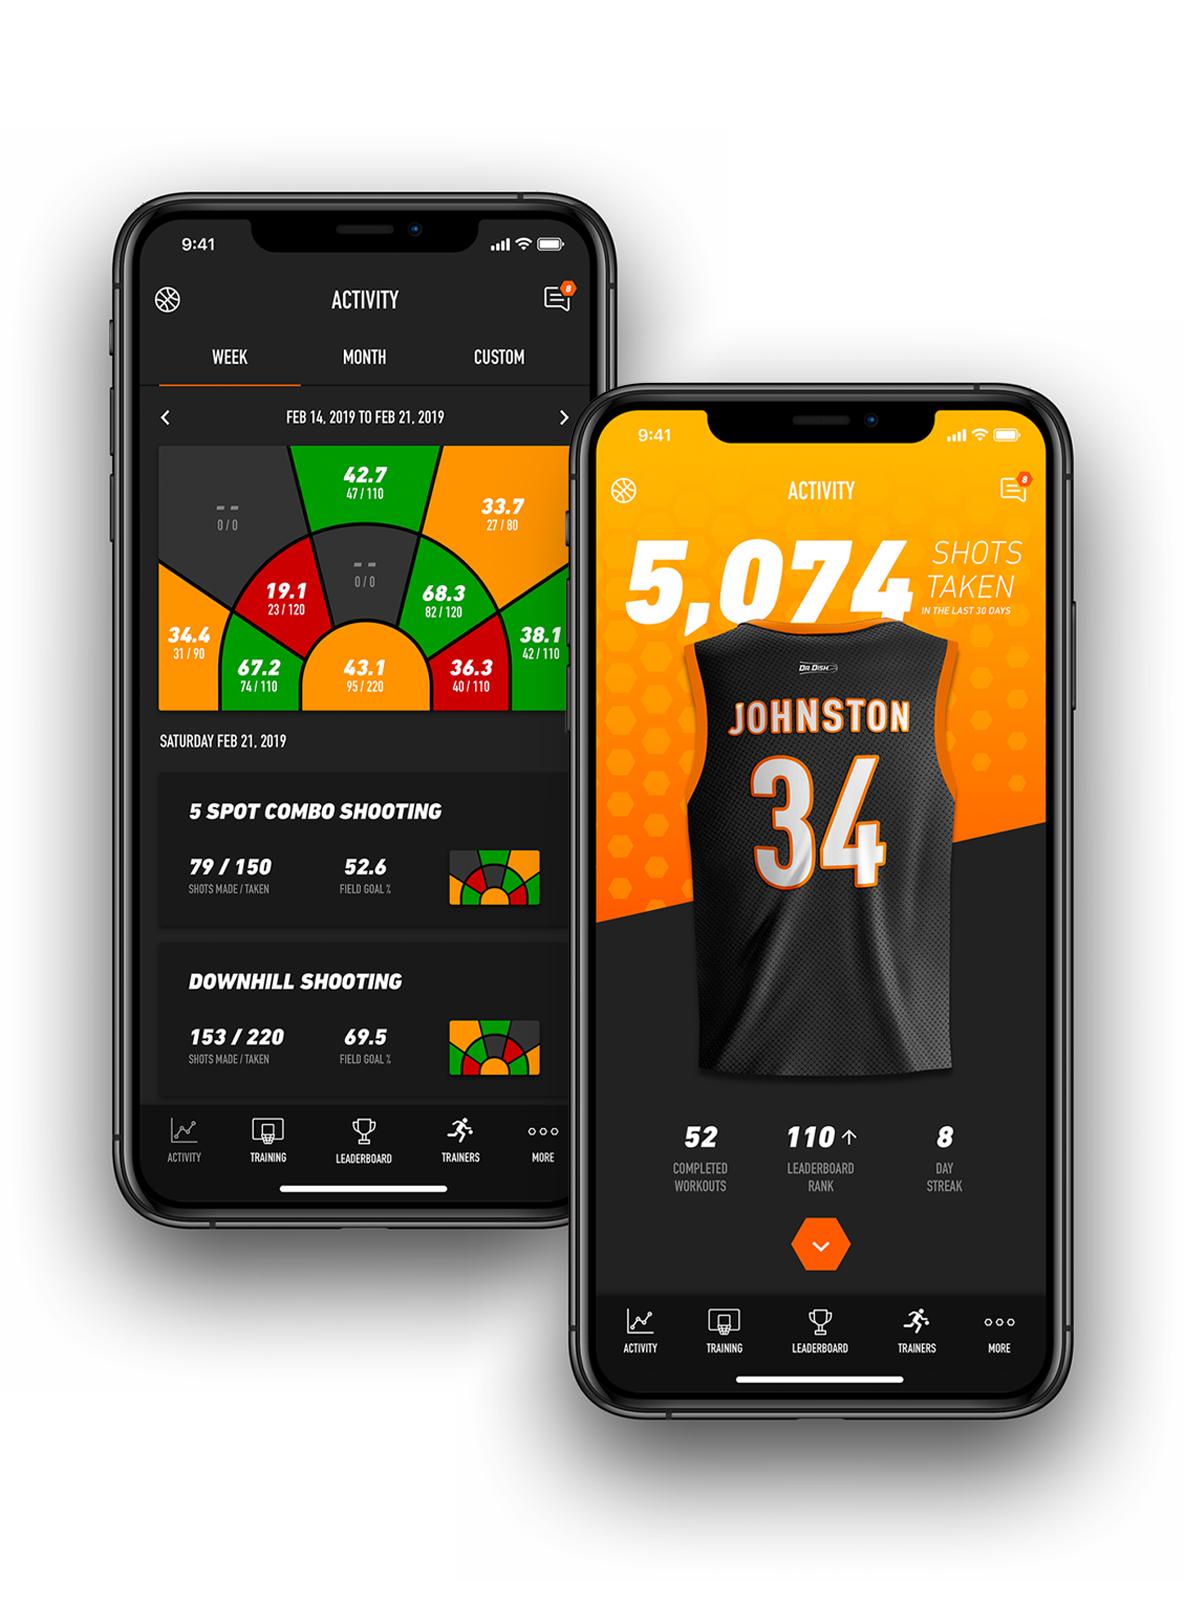 mobilegallery-app